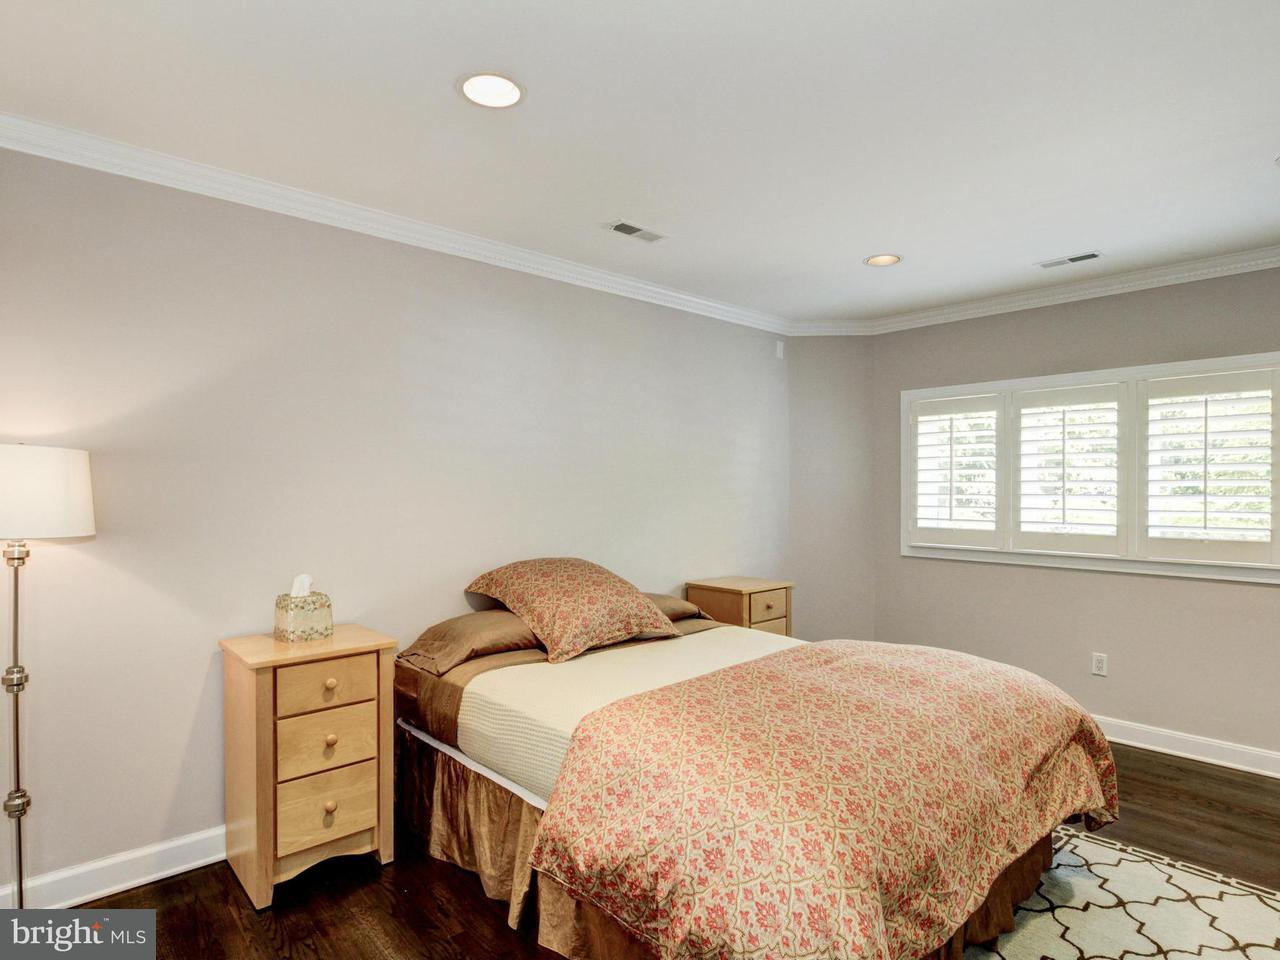 Additional photo for property listing at 4662 CHARLESTON TER NW 4662 CHARLESTON TER NW Washington, District De Columbia 20007 États-Unis